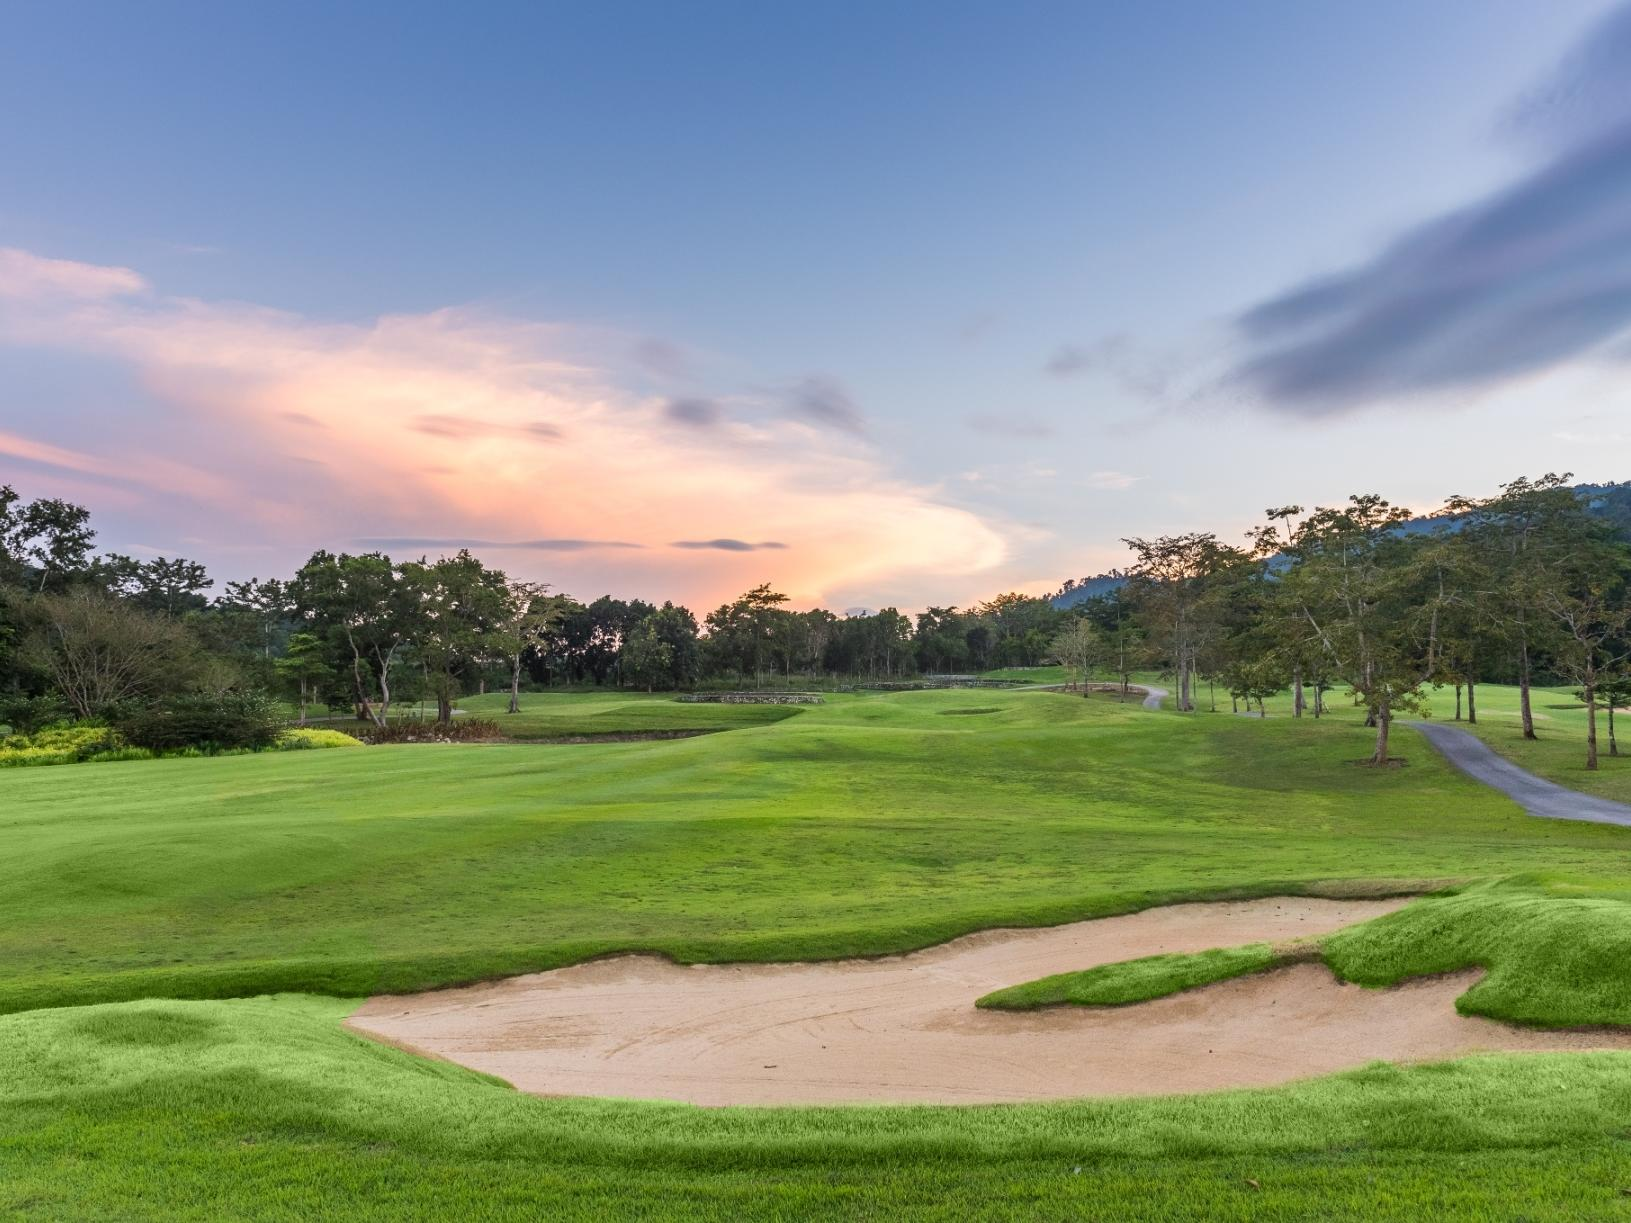 View of golf court at Chatrium Golf Resort Soi Dao Chanthaburi